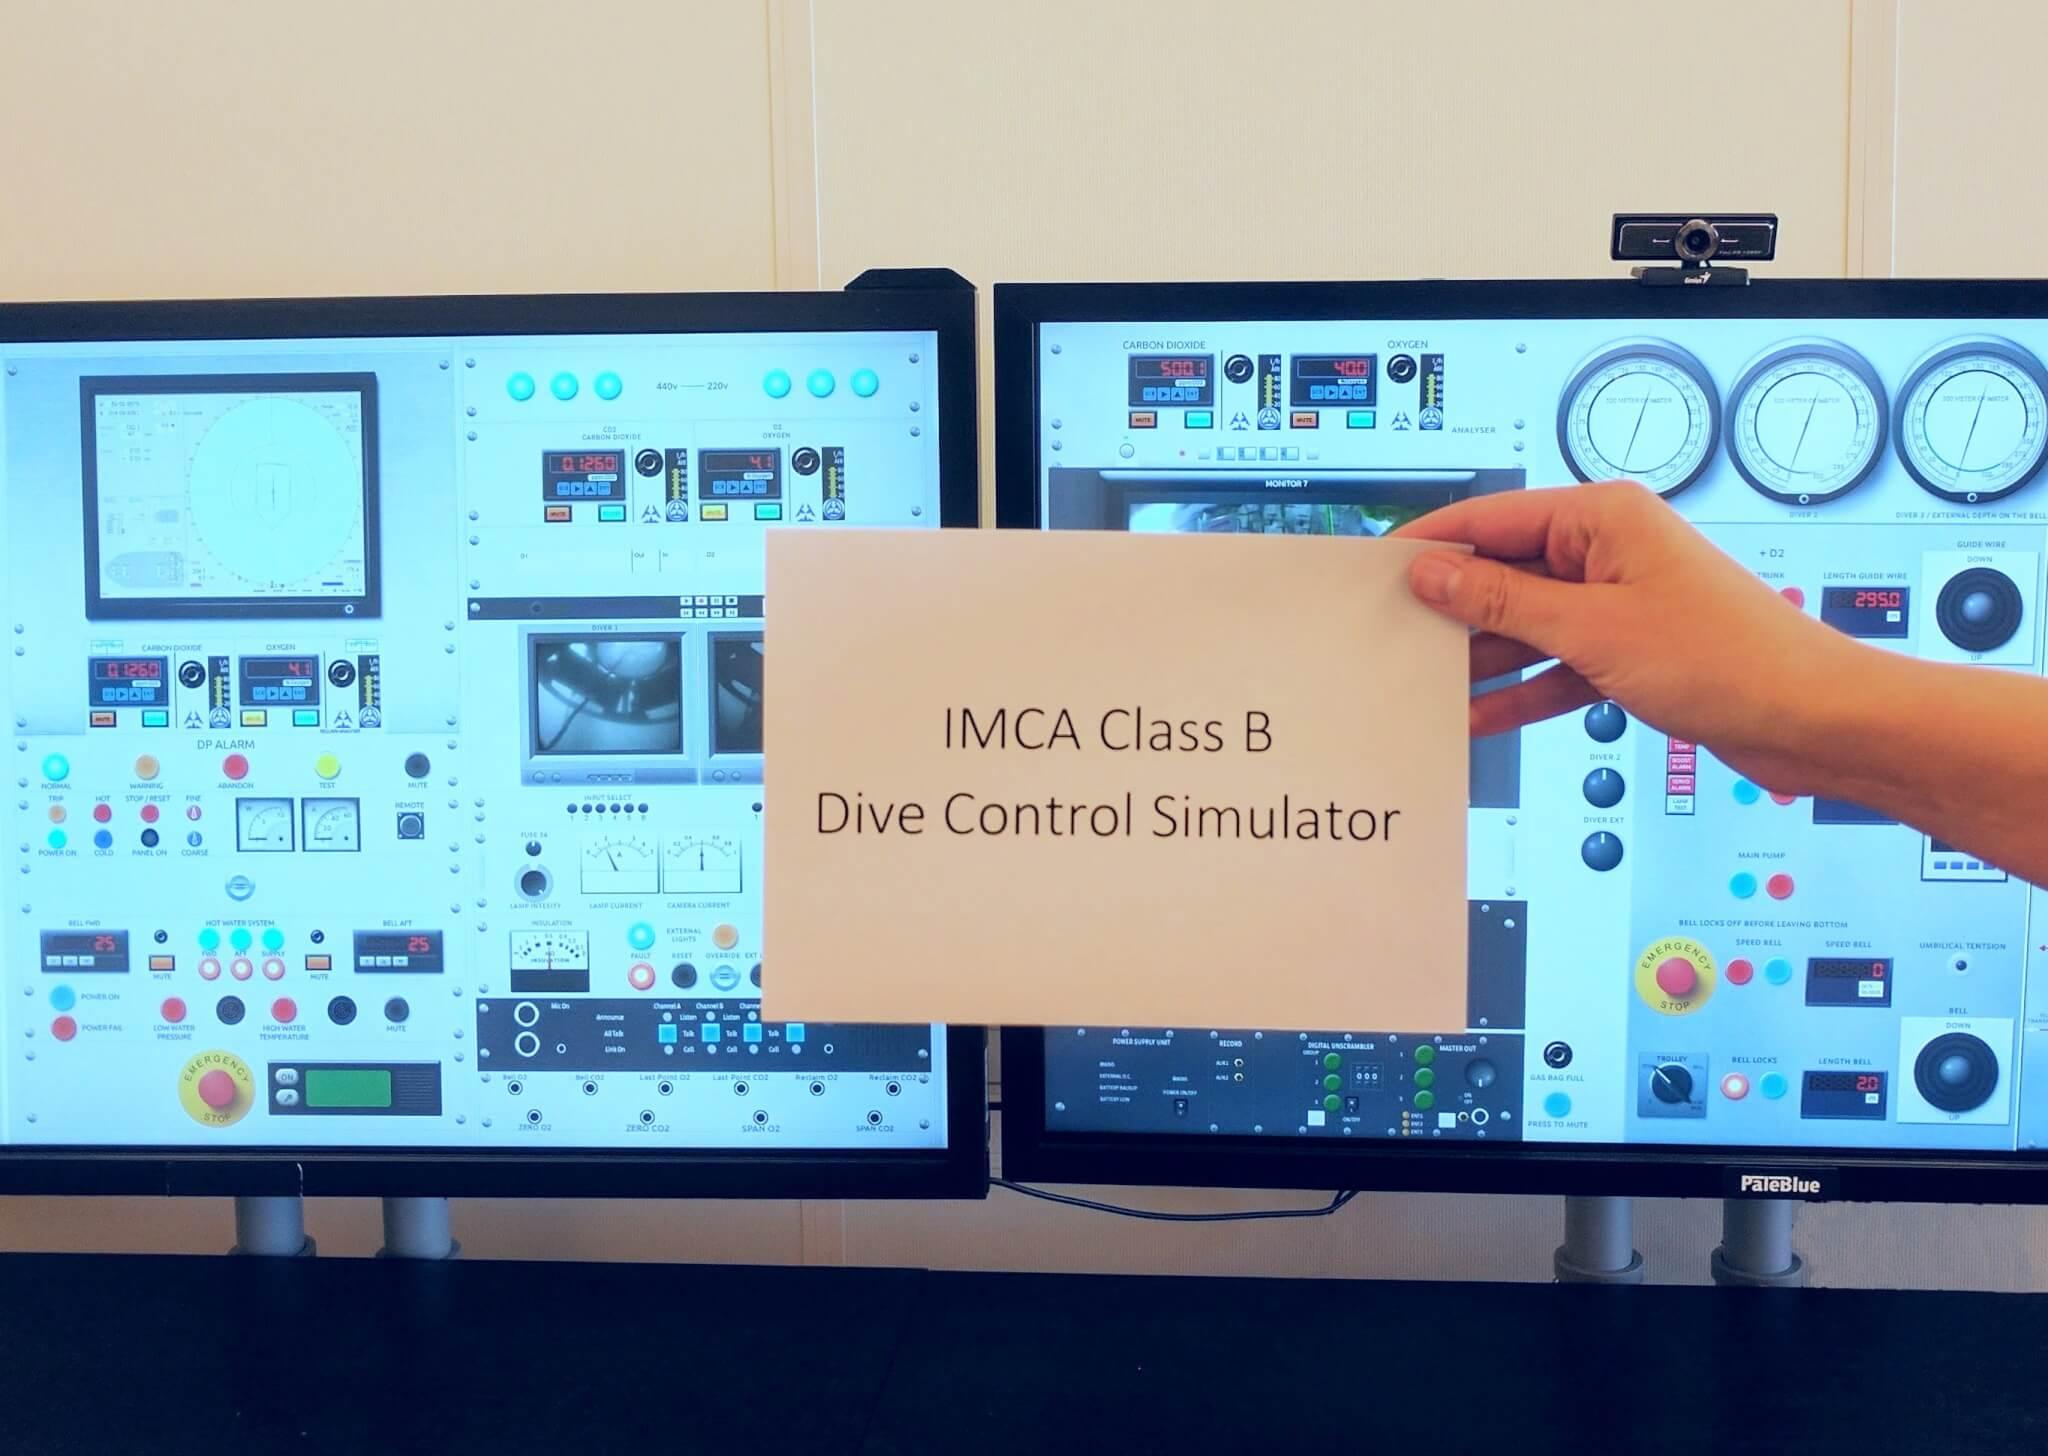 PaleBlue Simulators Recognized by IMCA